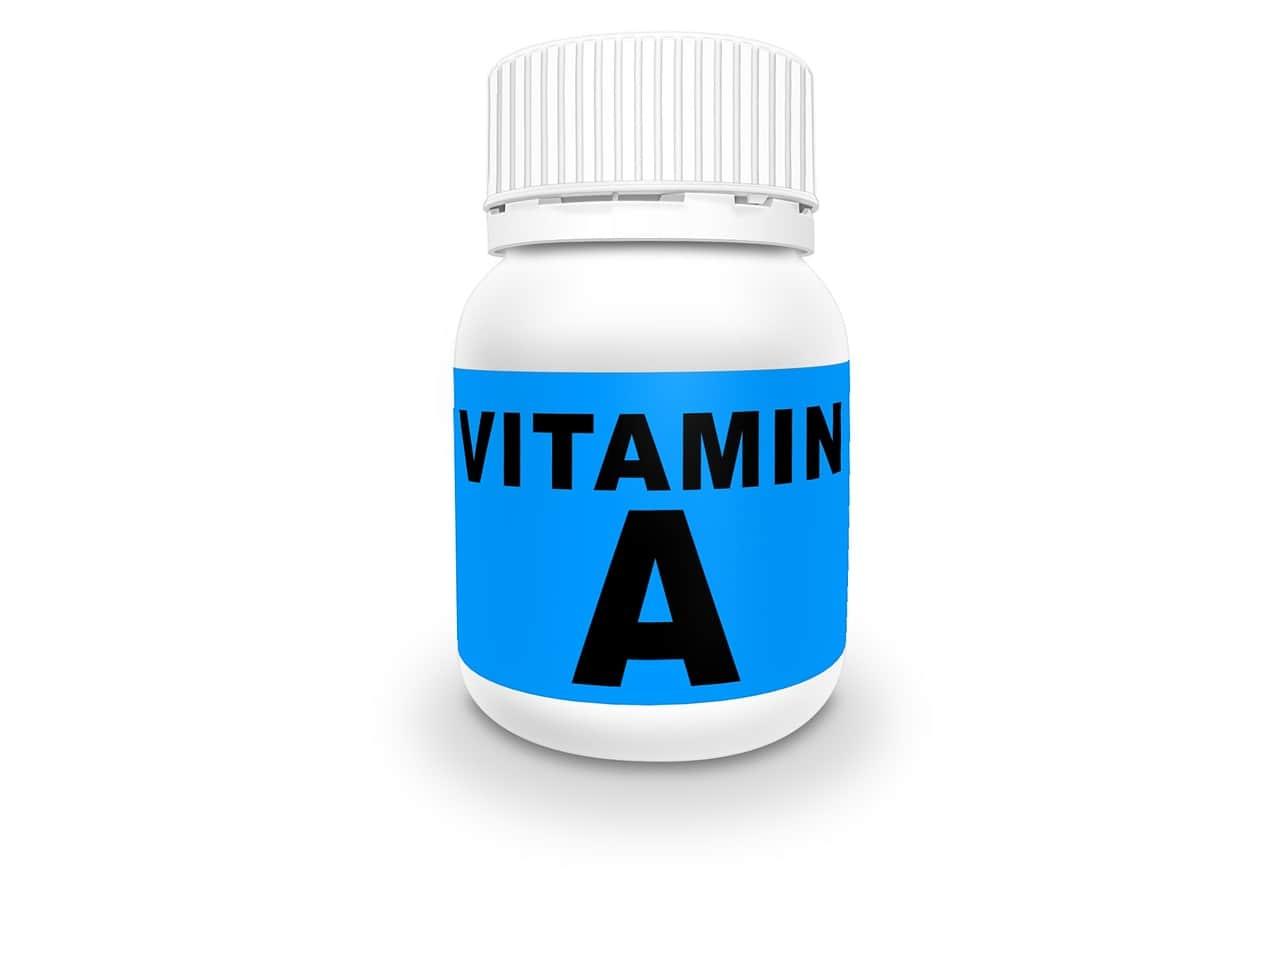 Vitamin A - Supplements